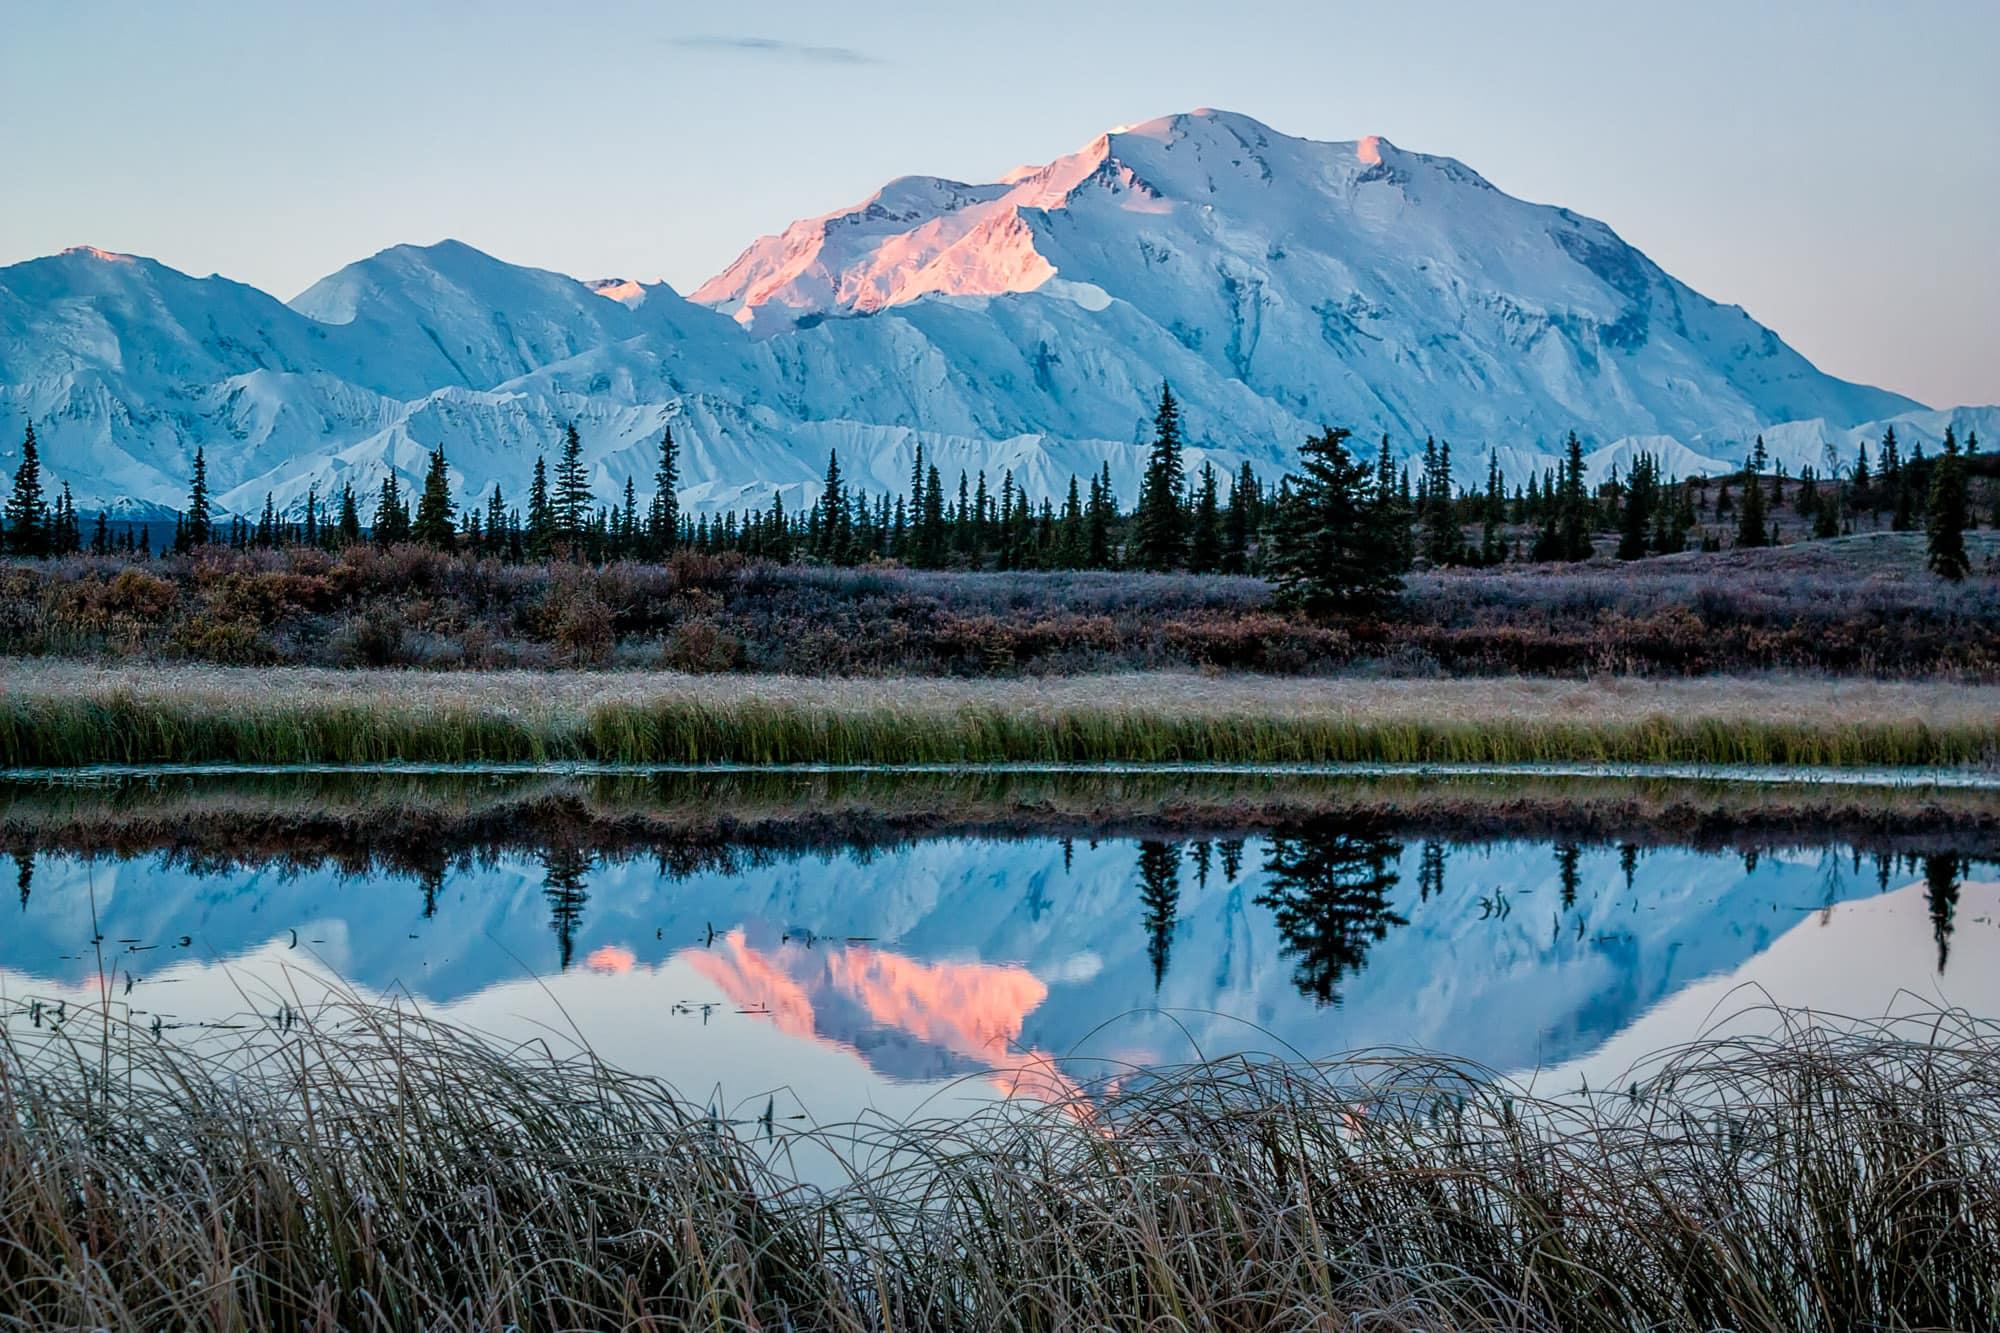 Mt. McKinley in NP Denali at sunrise, near Wonder Lake campsite, Alaska.